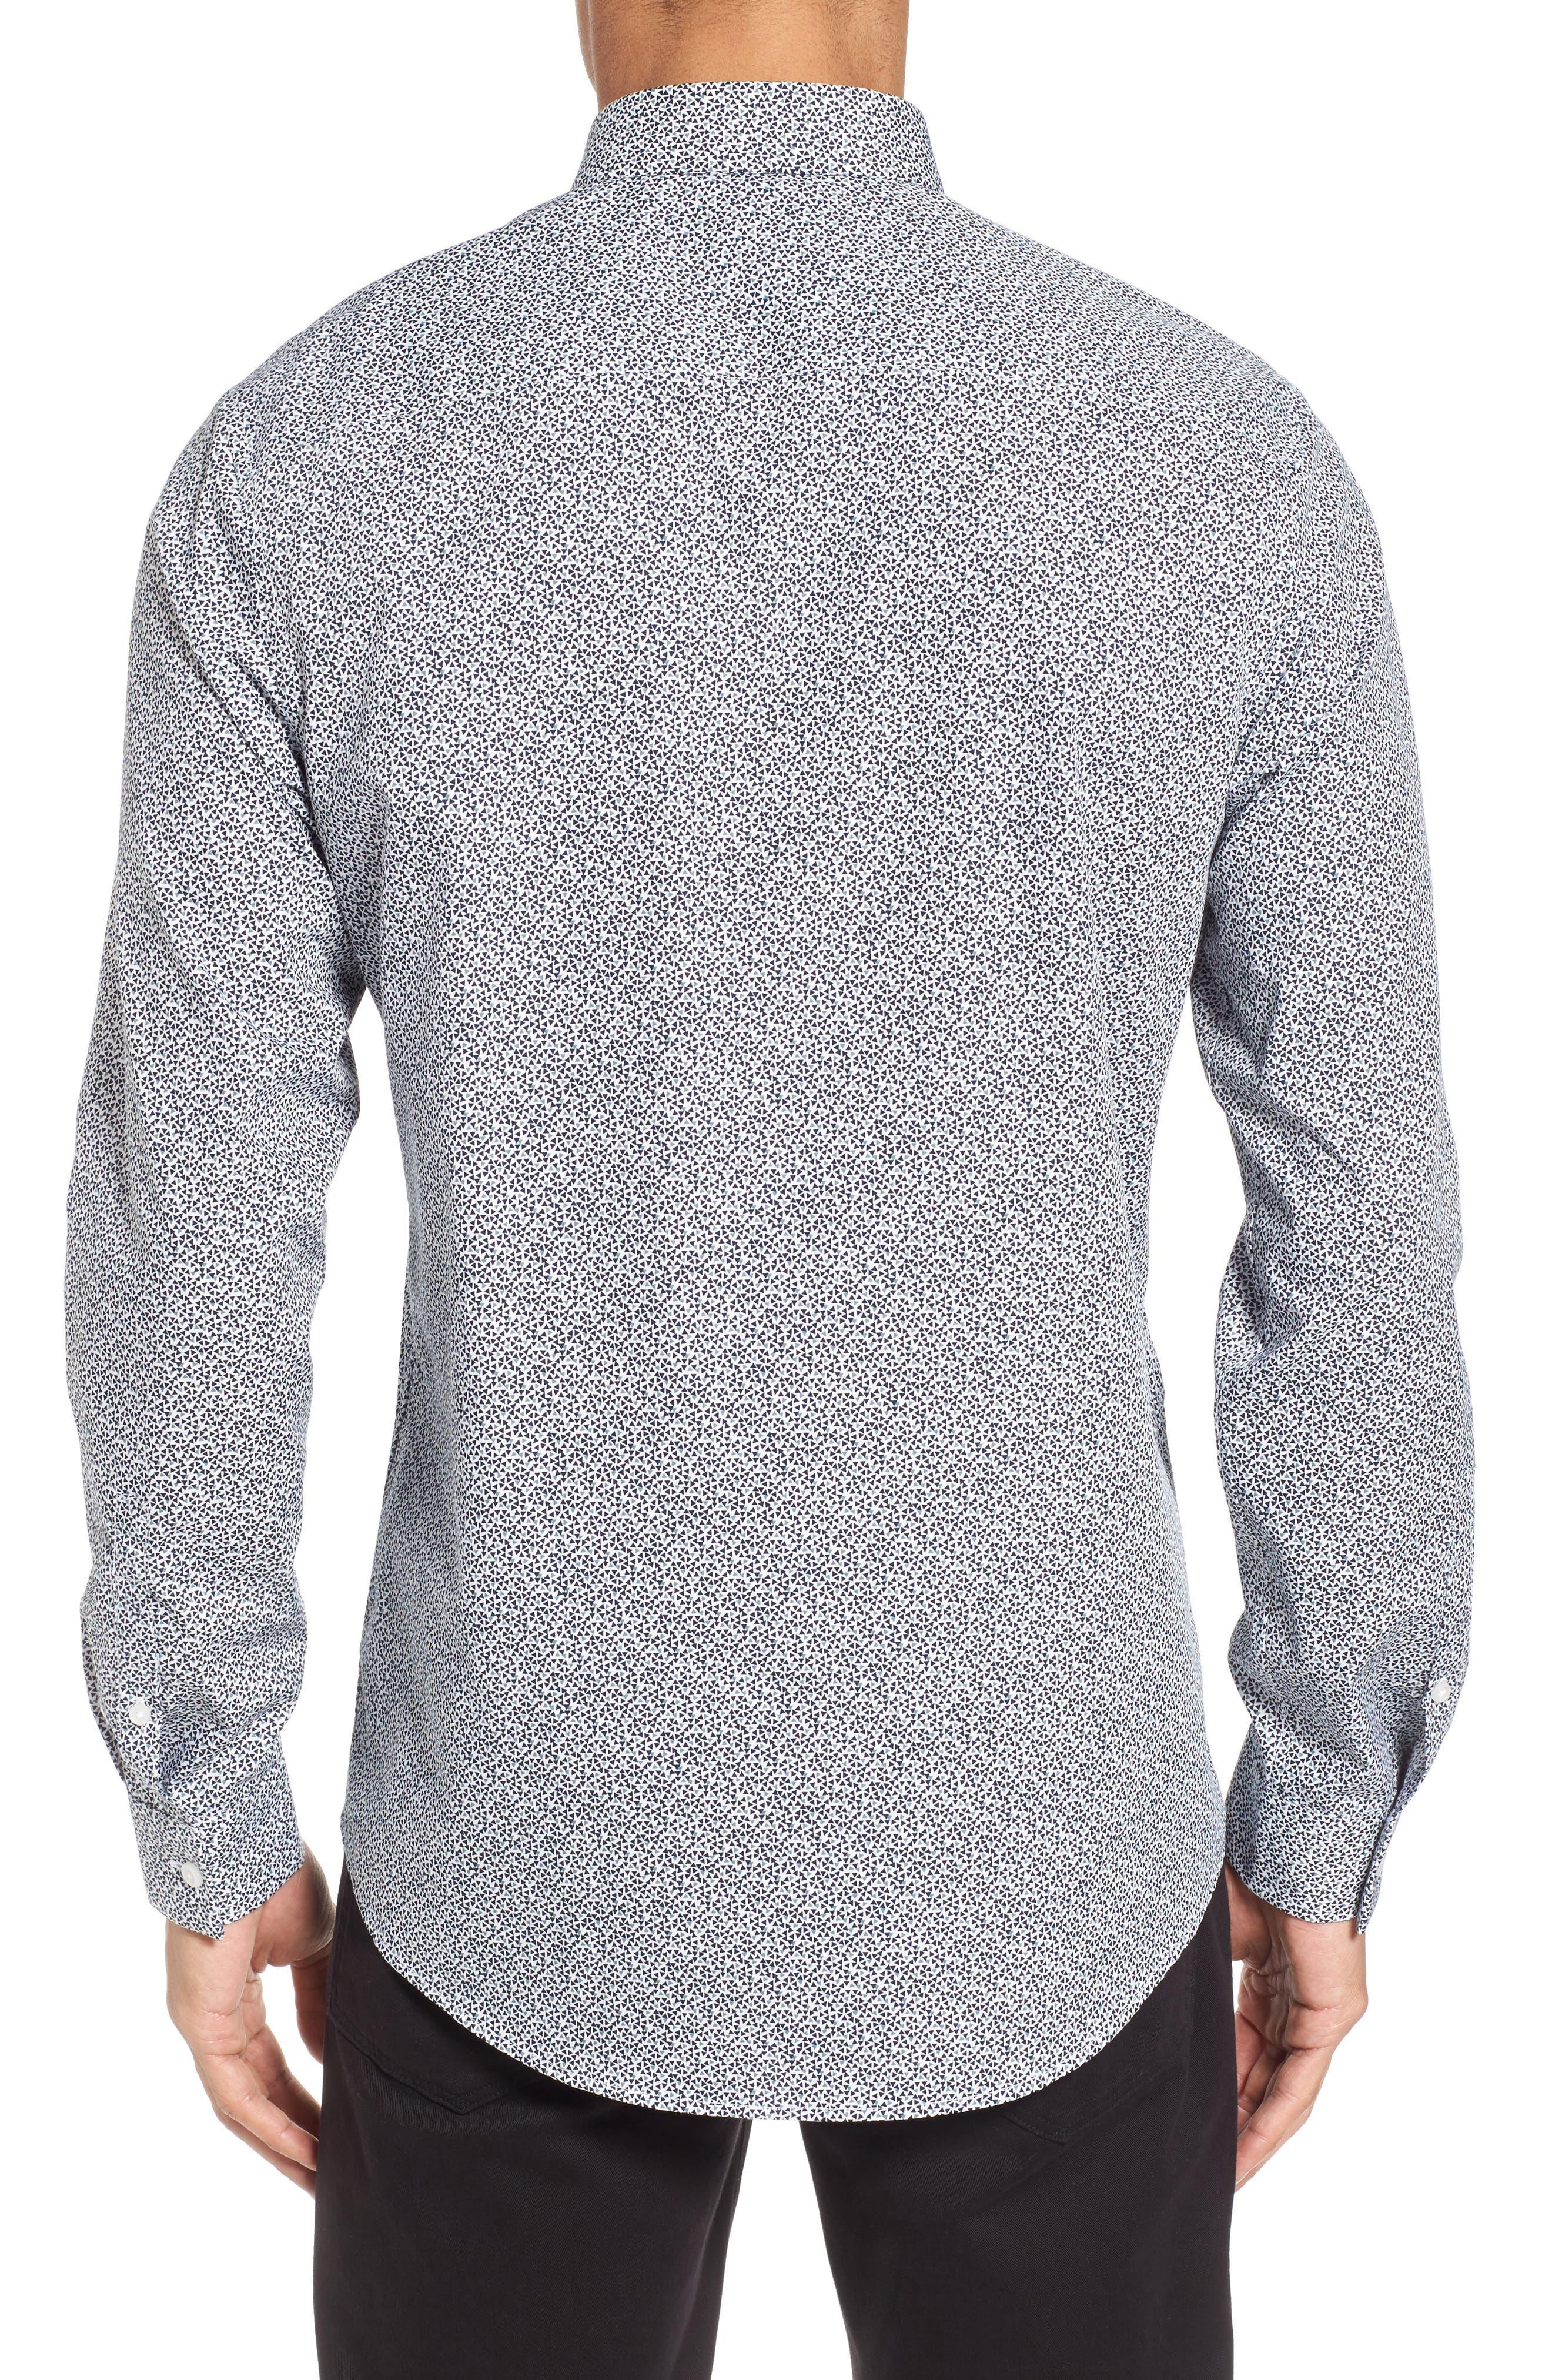 Trim Fit Geometric Sport Shirt,                             Alternate thumbnail 3, color,                             Navy Blue Scatter Triangles